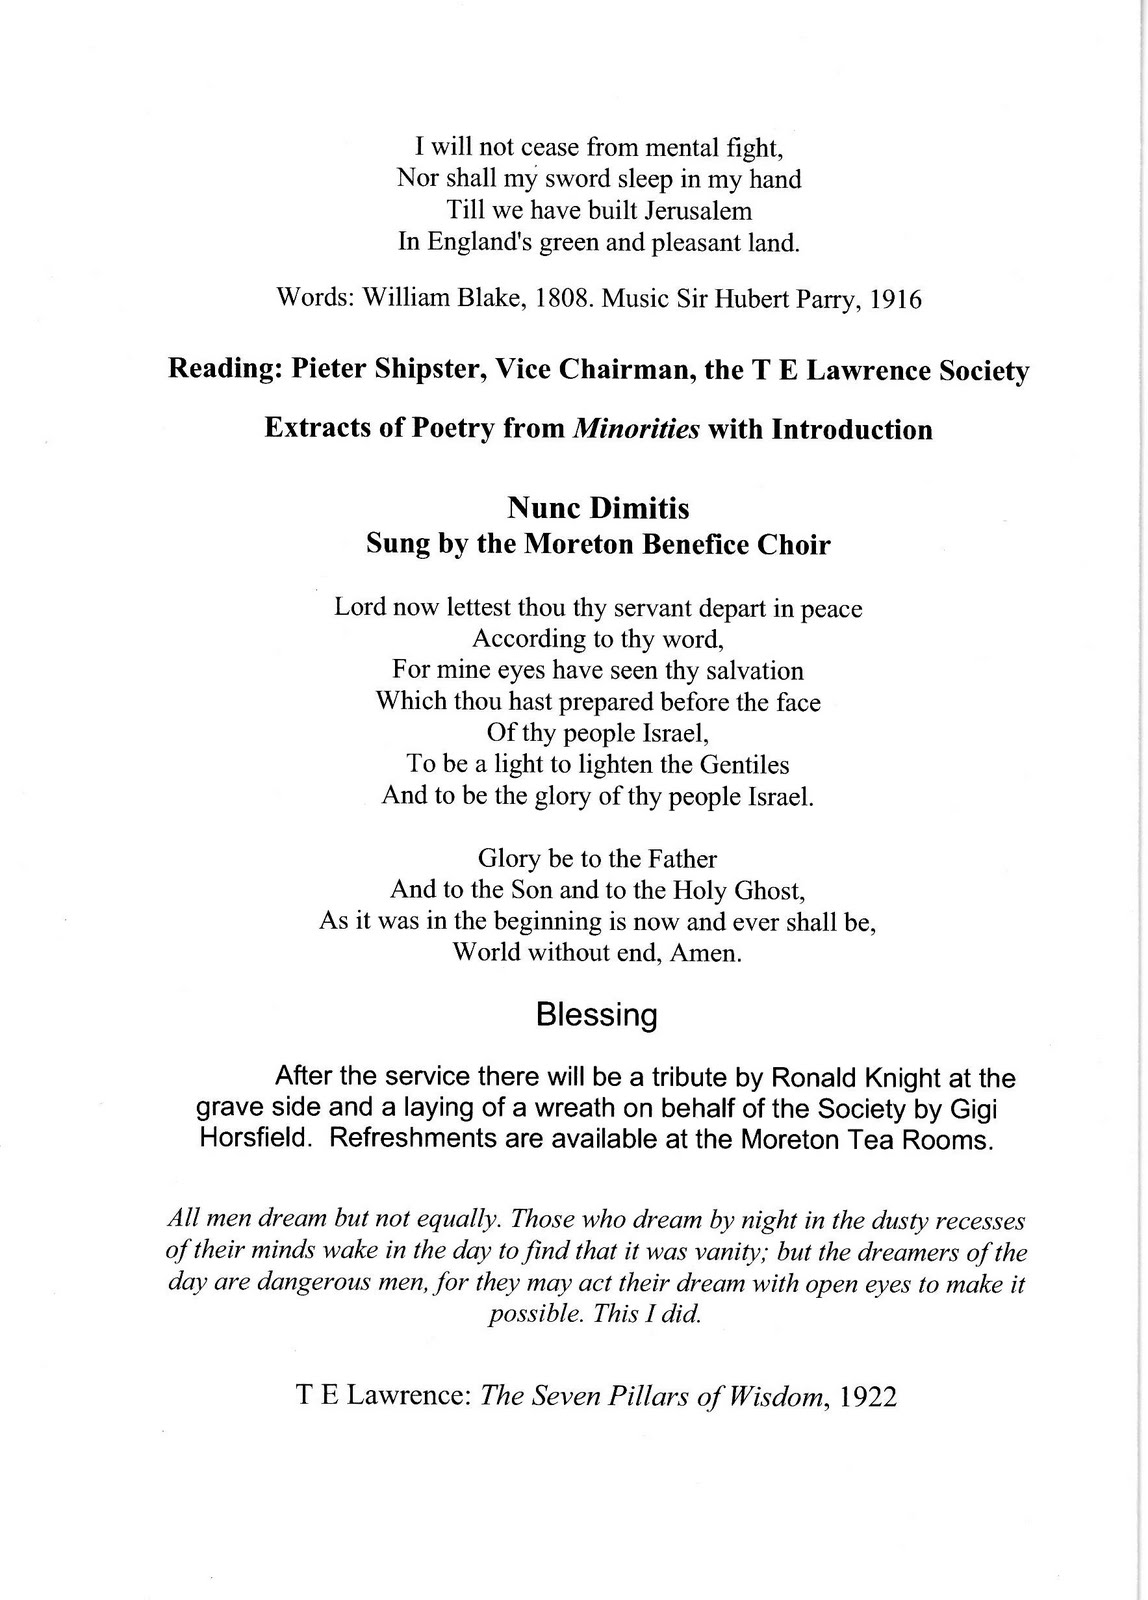 Church Anniversary Poems | quotes.lol-rofl.com